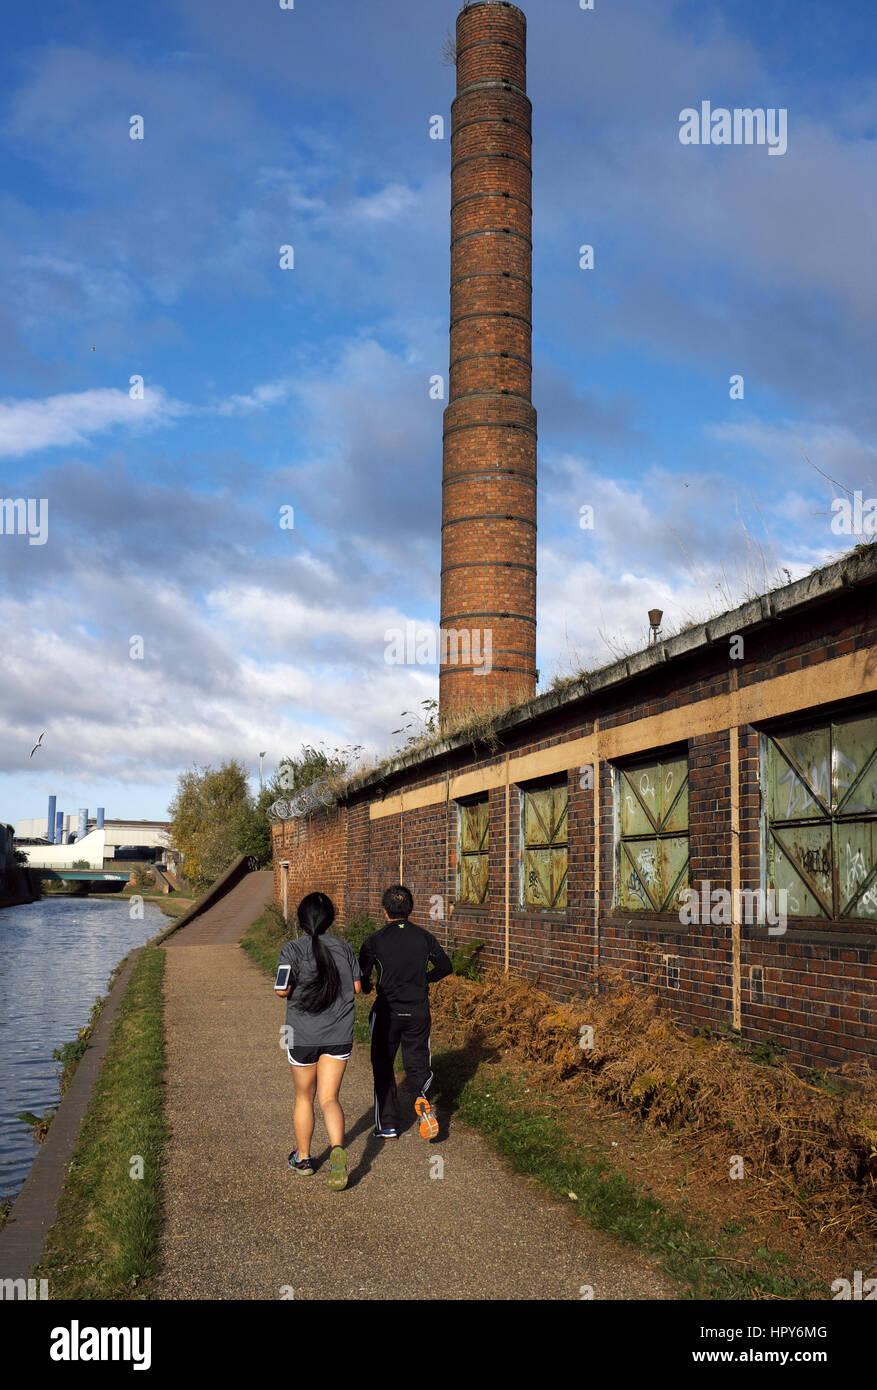 Birmingham Canal Navigations New Main Line, Smethwick, West Midlands, England, UK - Stock Image